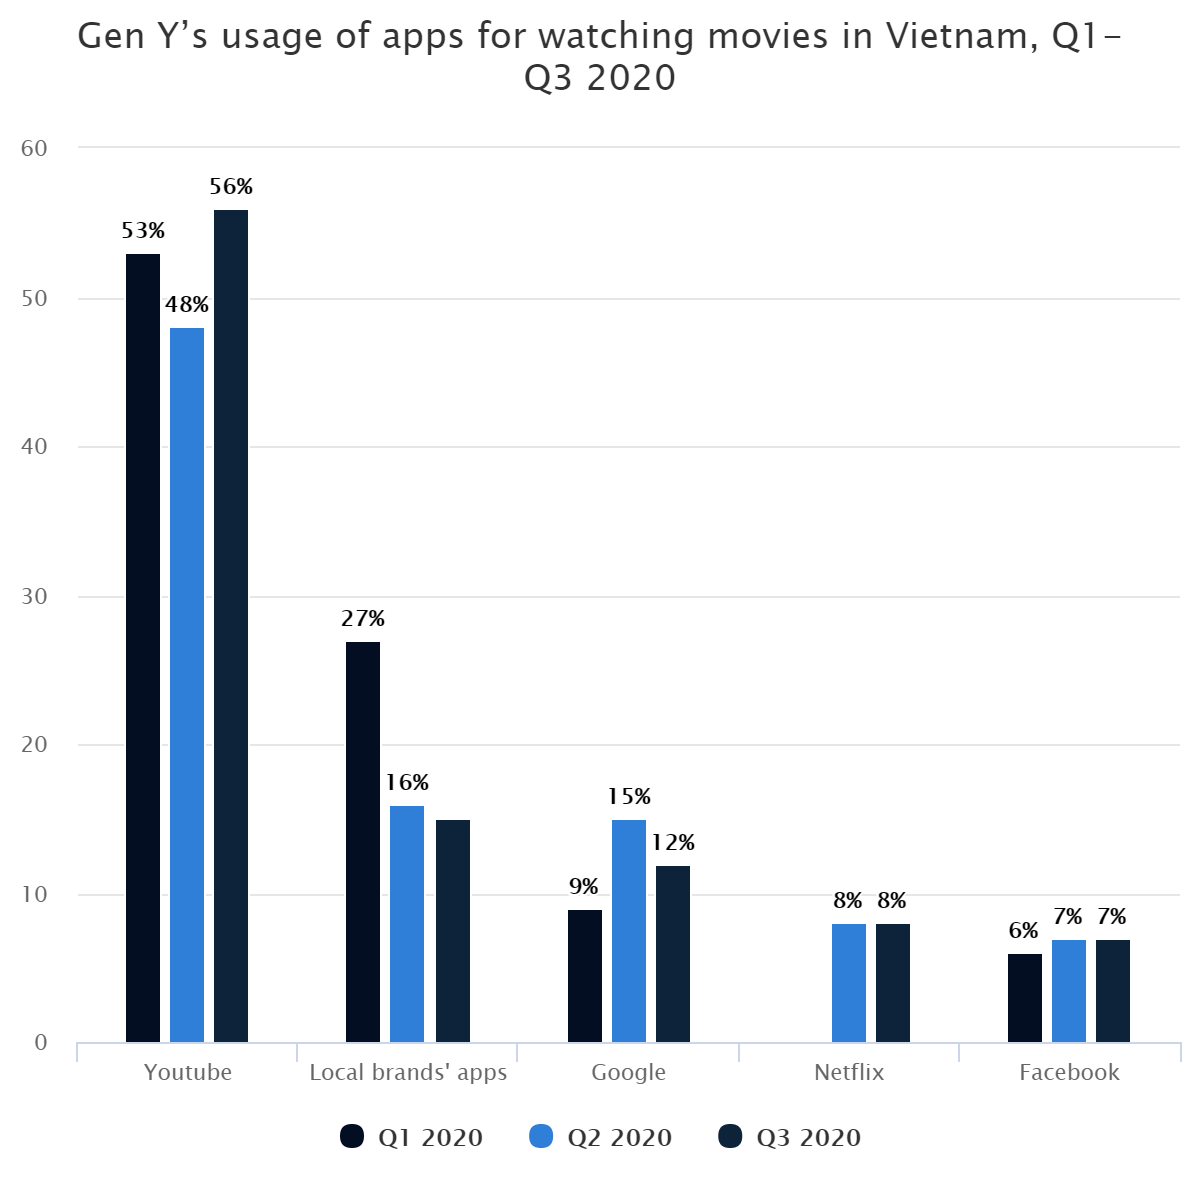 Gen Y's usage of apps for watching movies in Vietnam, Q1-Q3 2020